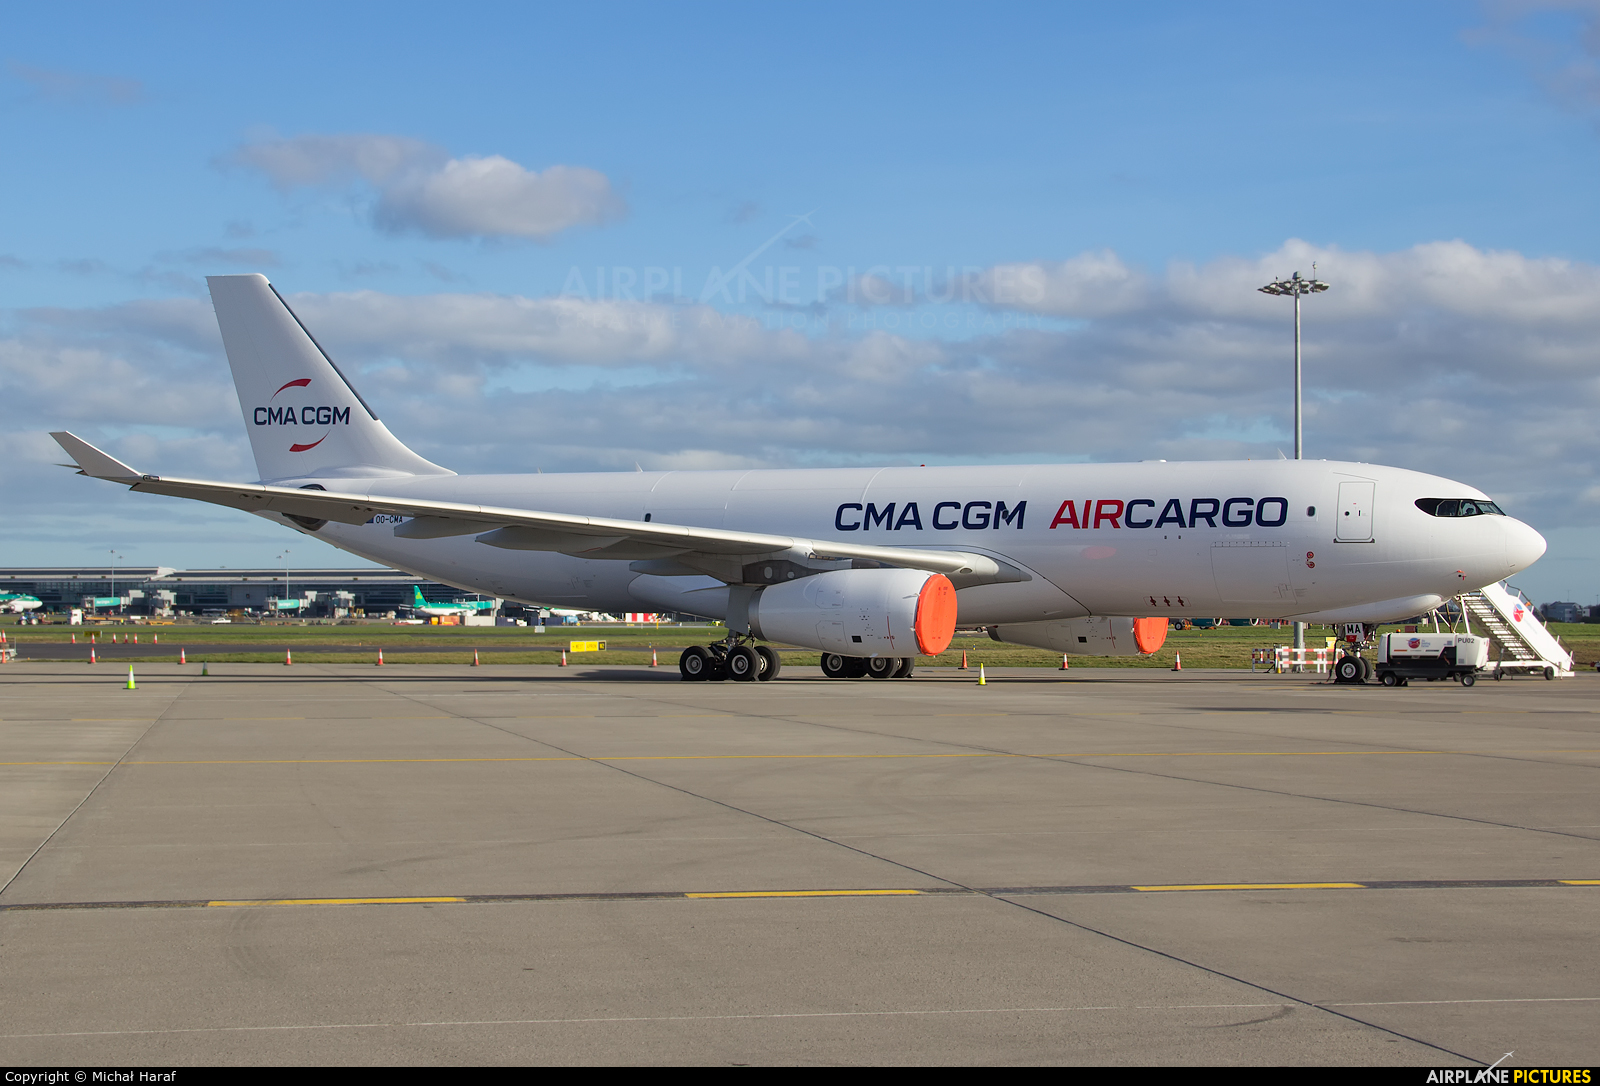 CMA CGM Aircargo (Air Belgium) OO-CMA aircraft at Dublin